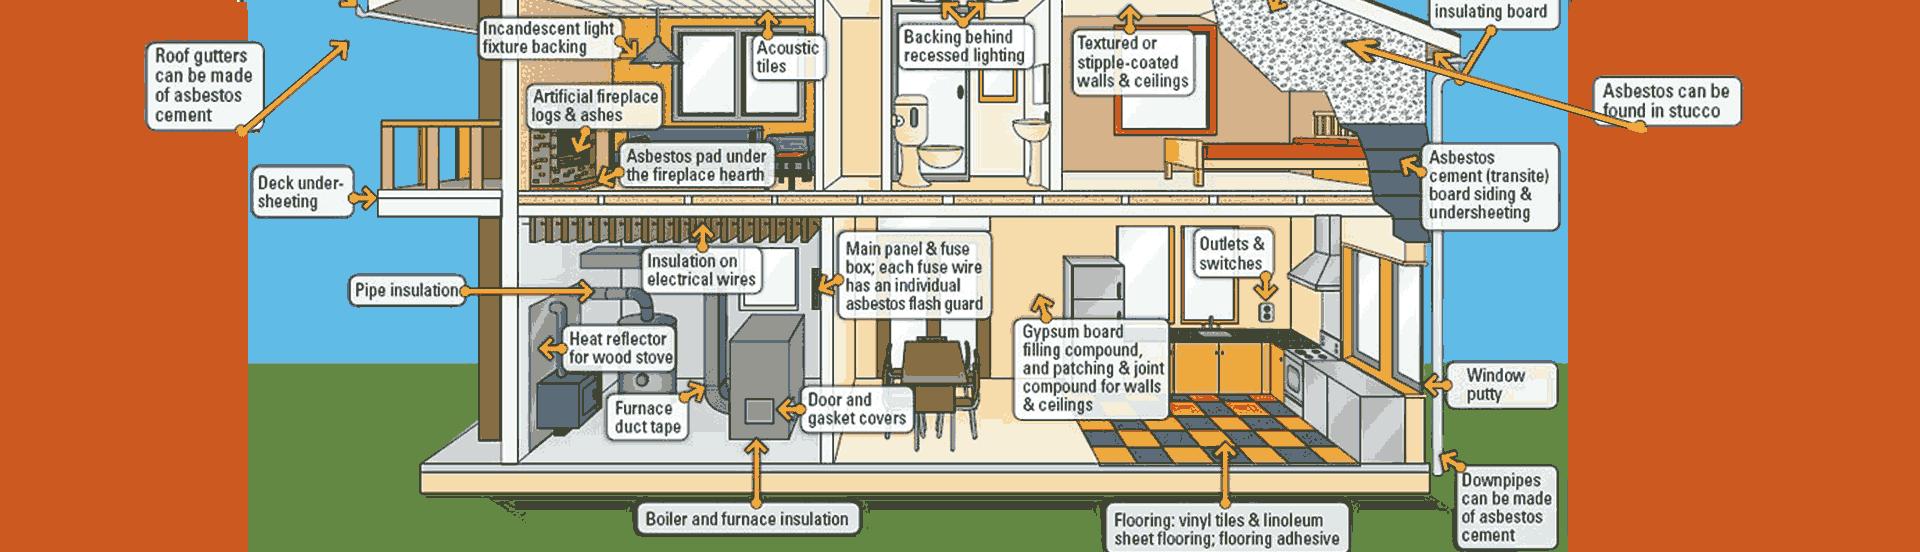 Where Asbestos is Found.